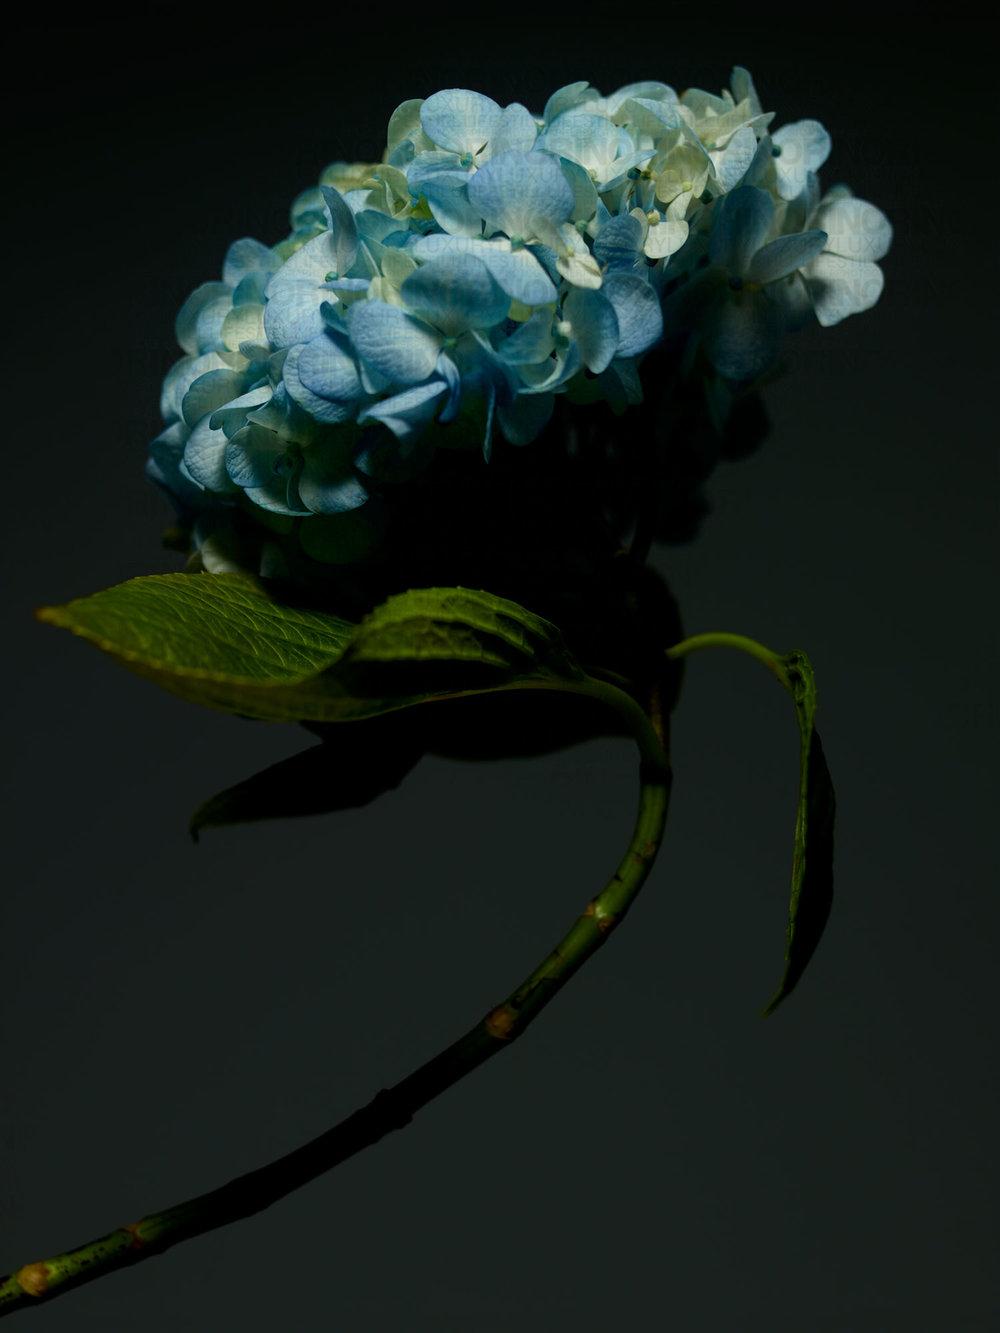 061916_flower125472_wm.jpg